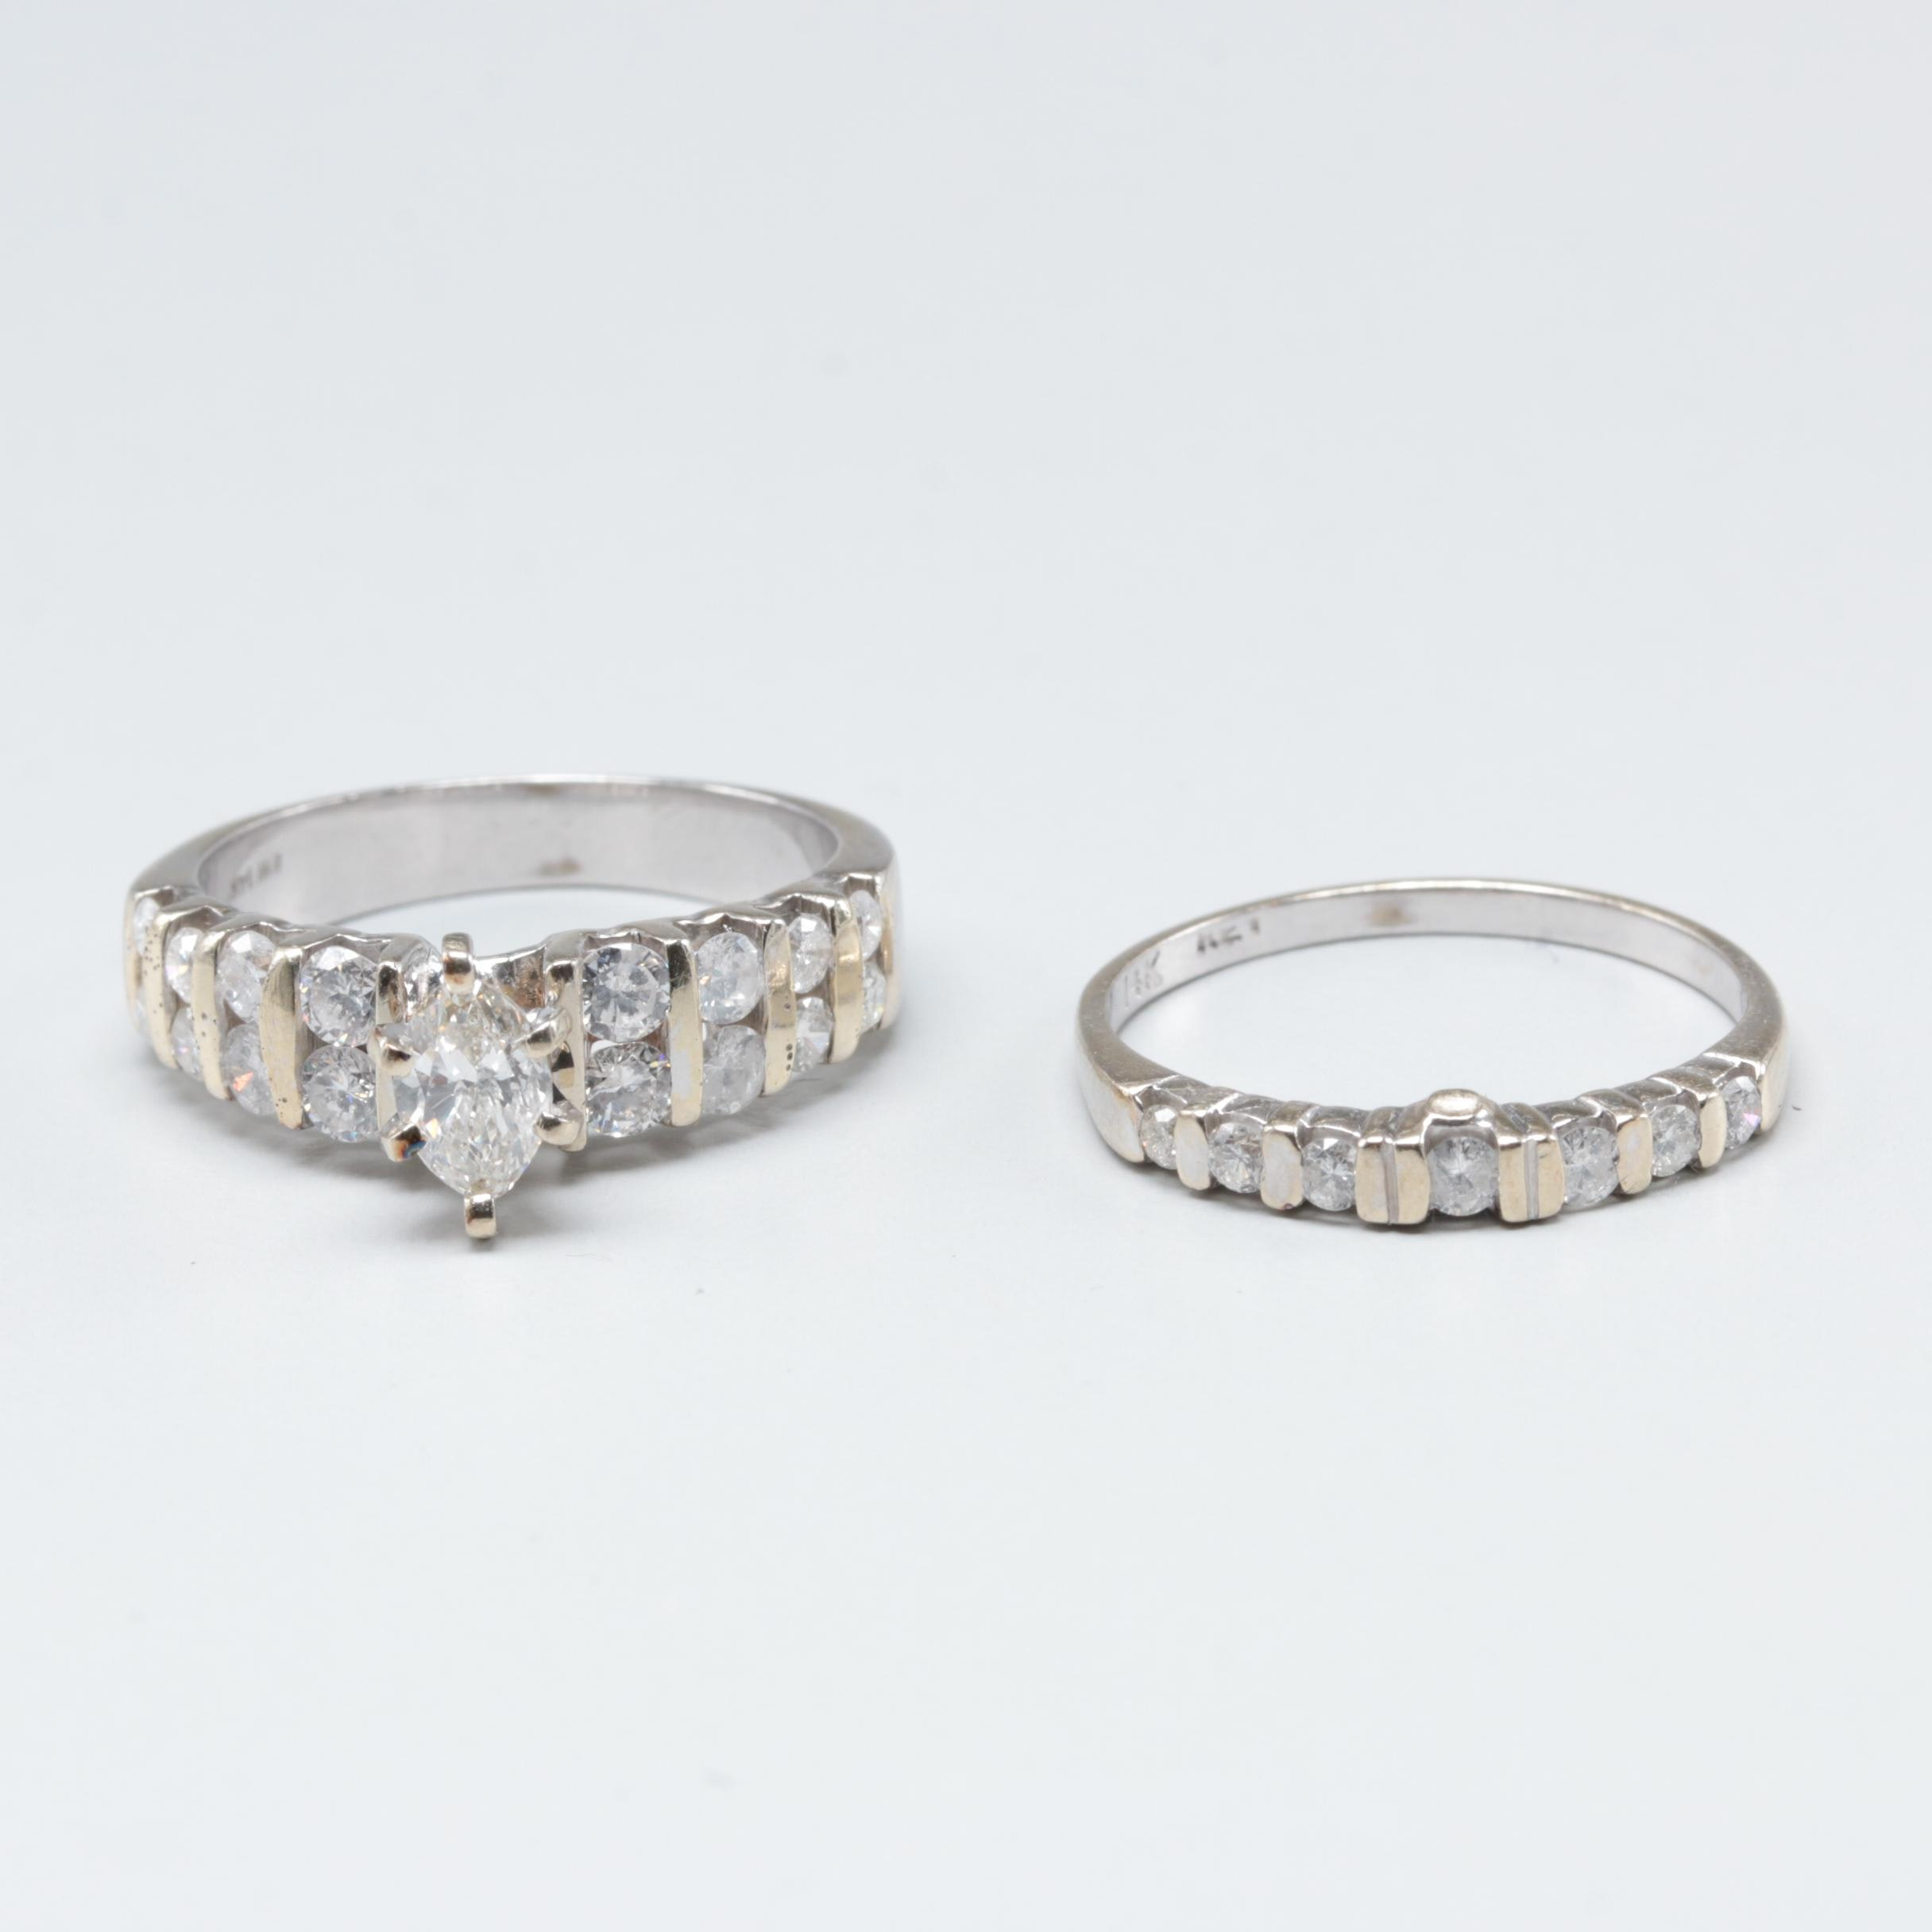 14K White Gold 1.48 CTW Diamond Ring Set